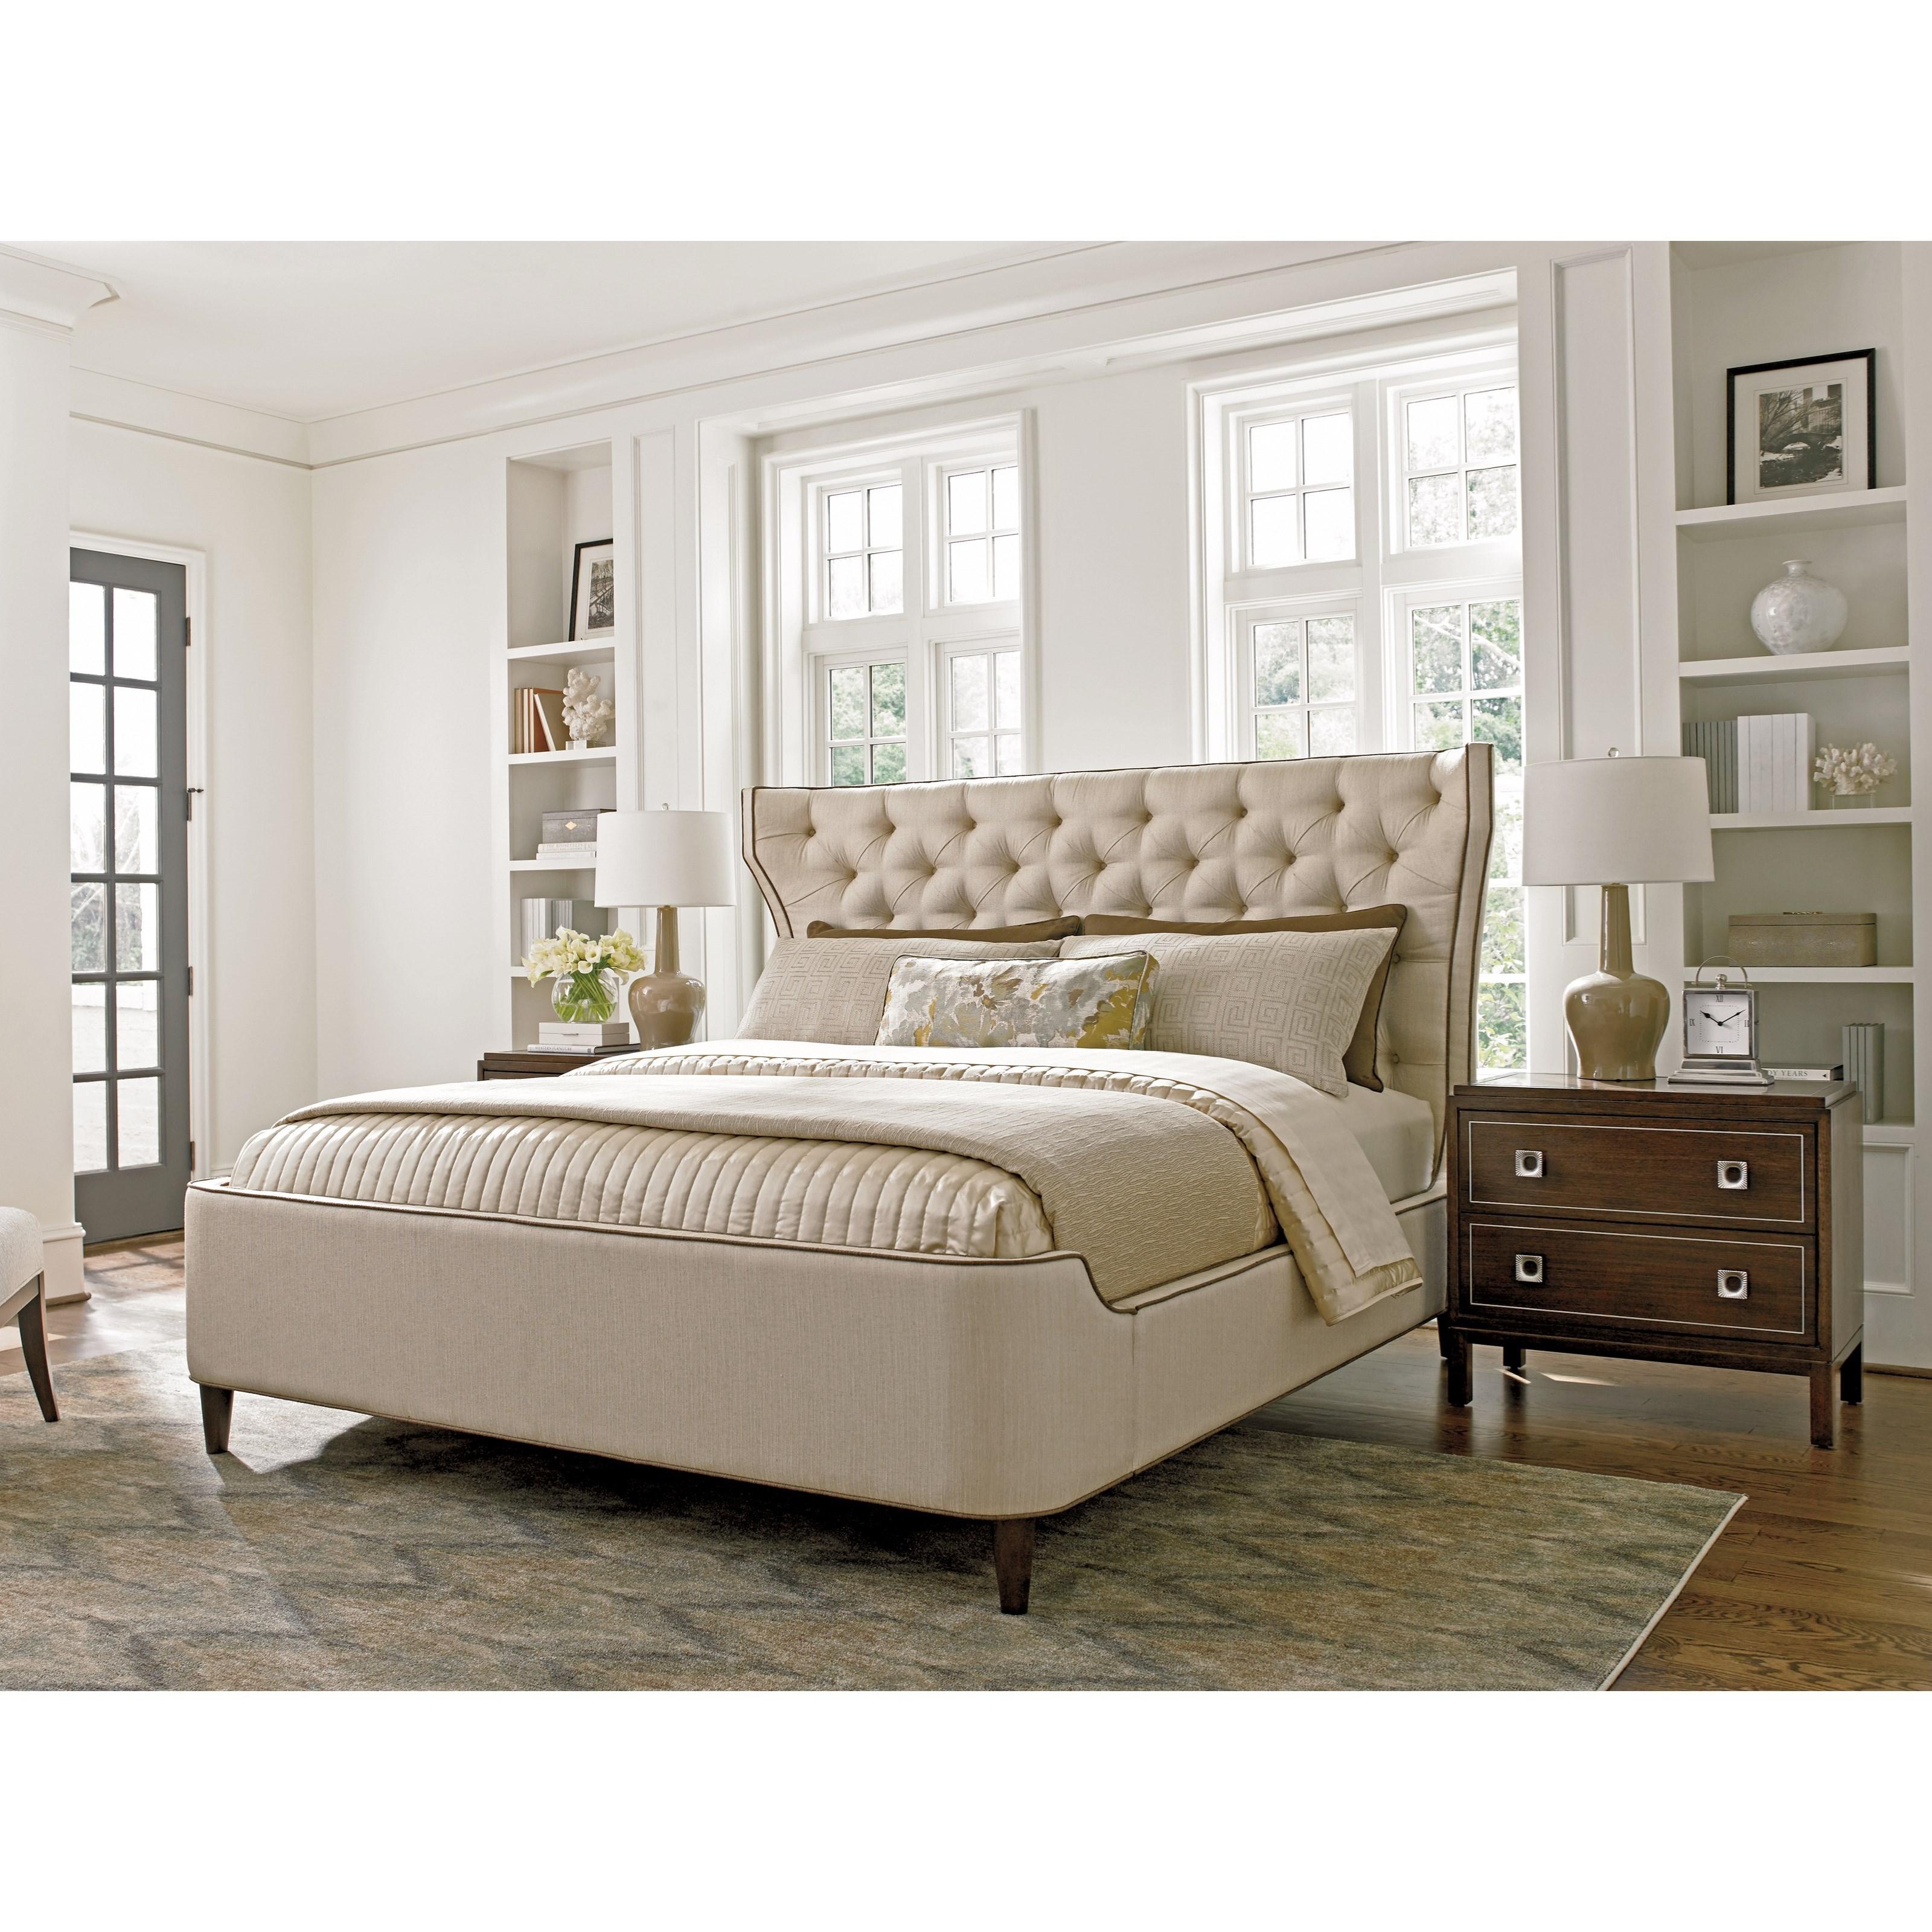 MacArthur Park King Bedroom Group by Lexington at Baer's Furniture